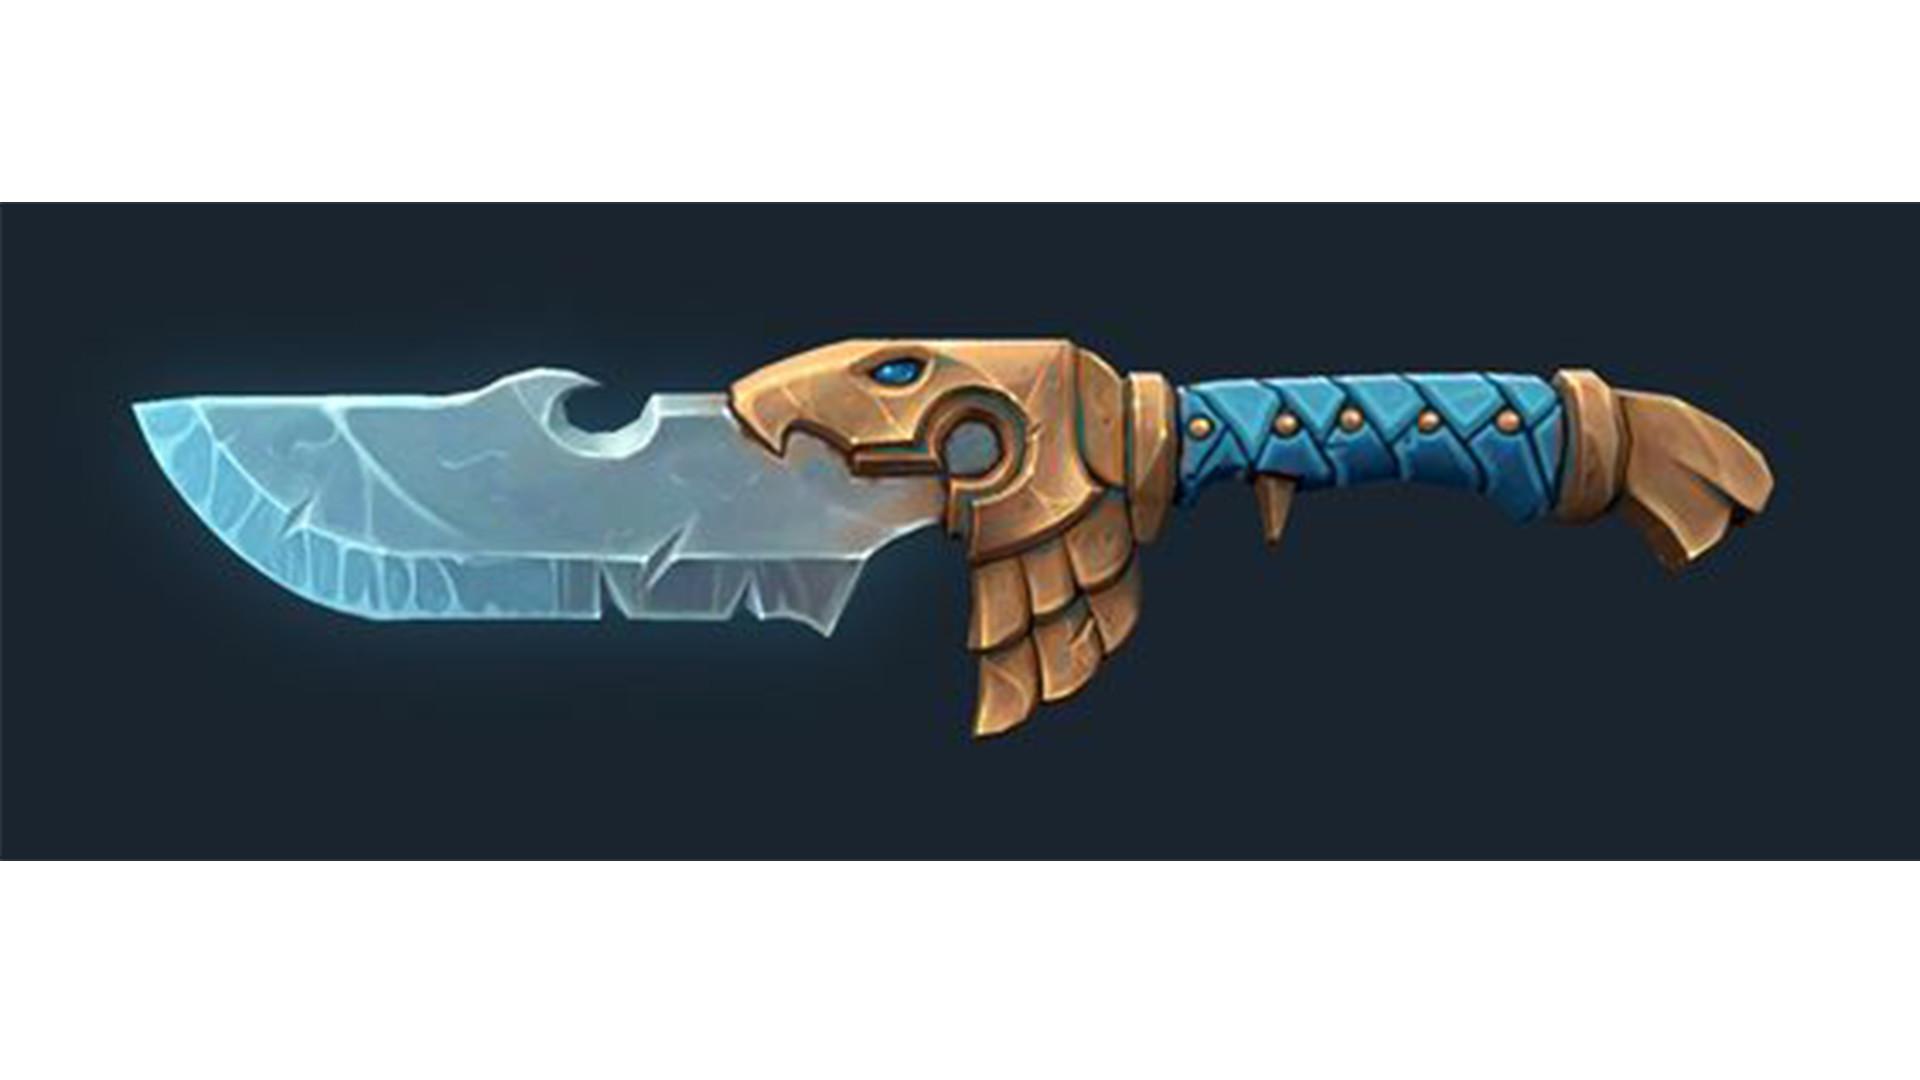 eric rivera stylized fantasy dagger